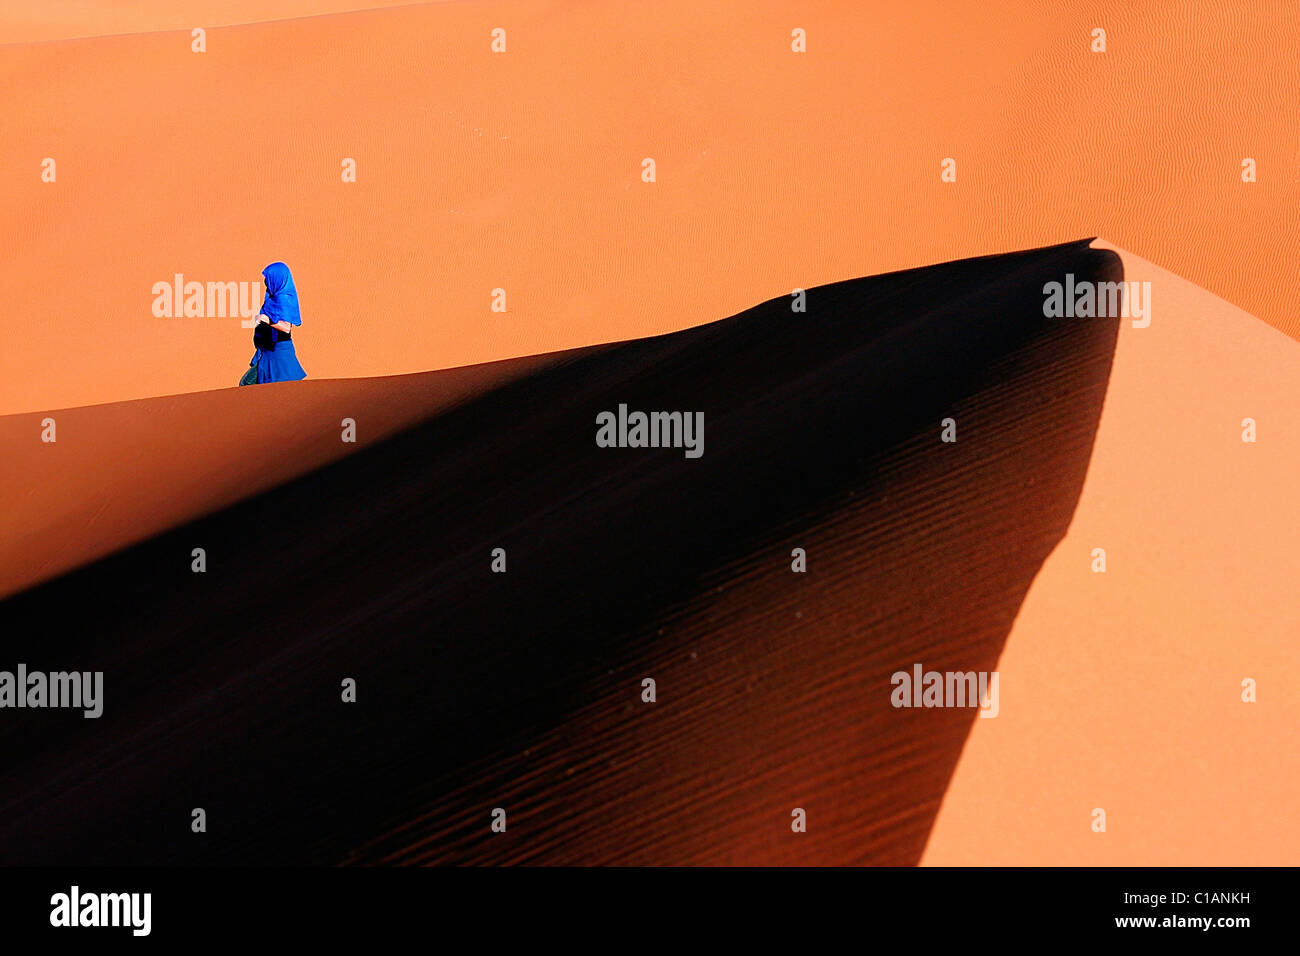 Dunes, Sahara desert, Morocco, North Africa - Stock Image